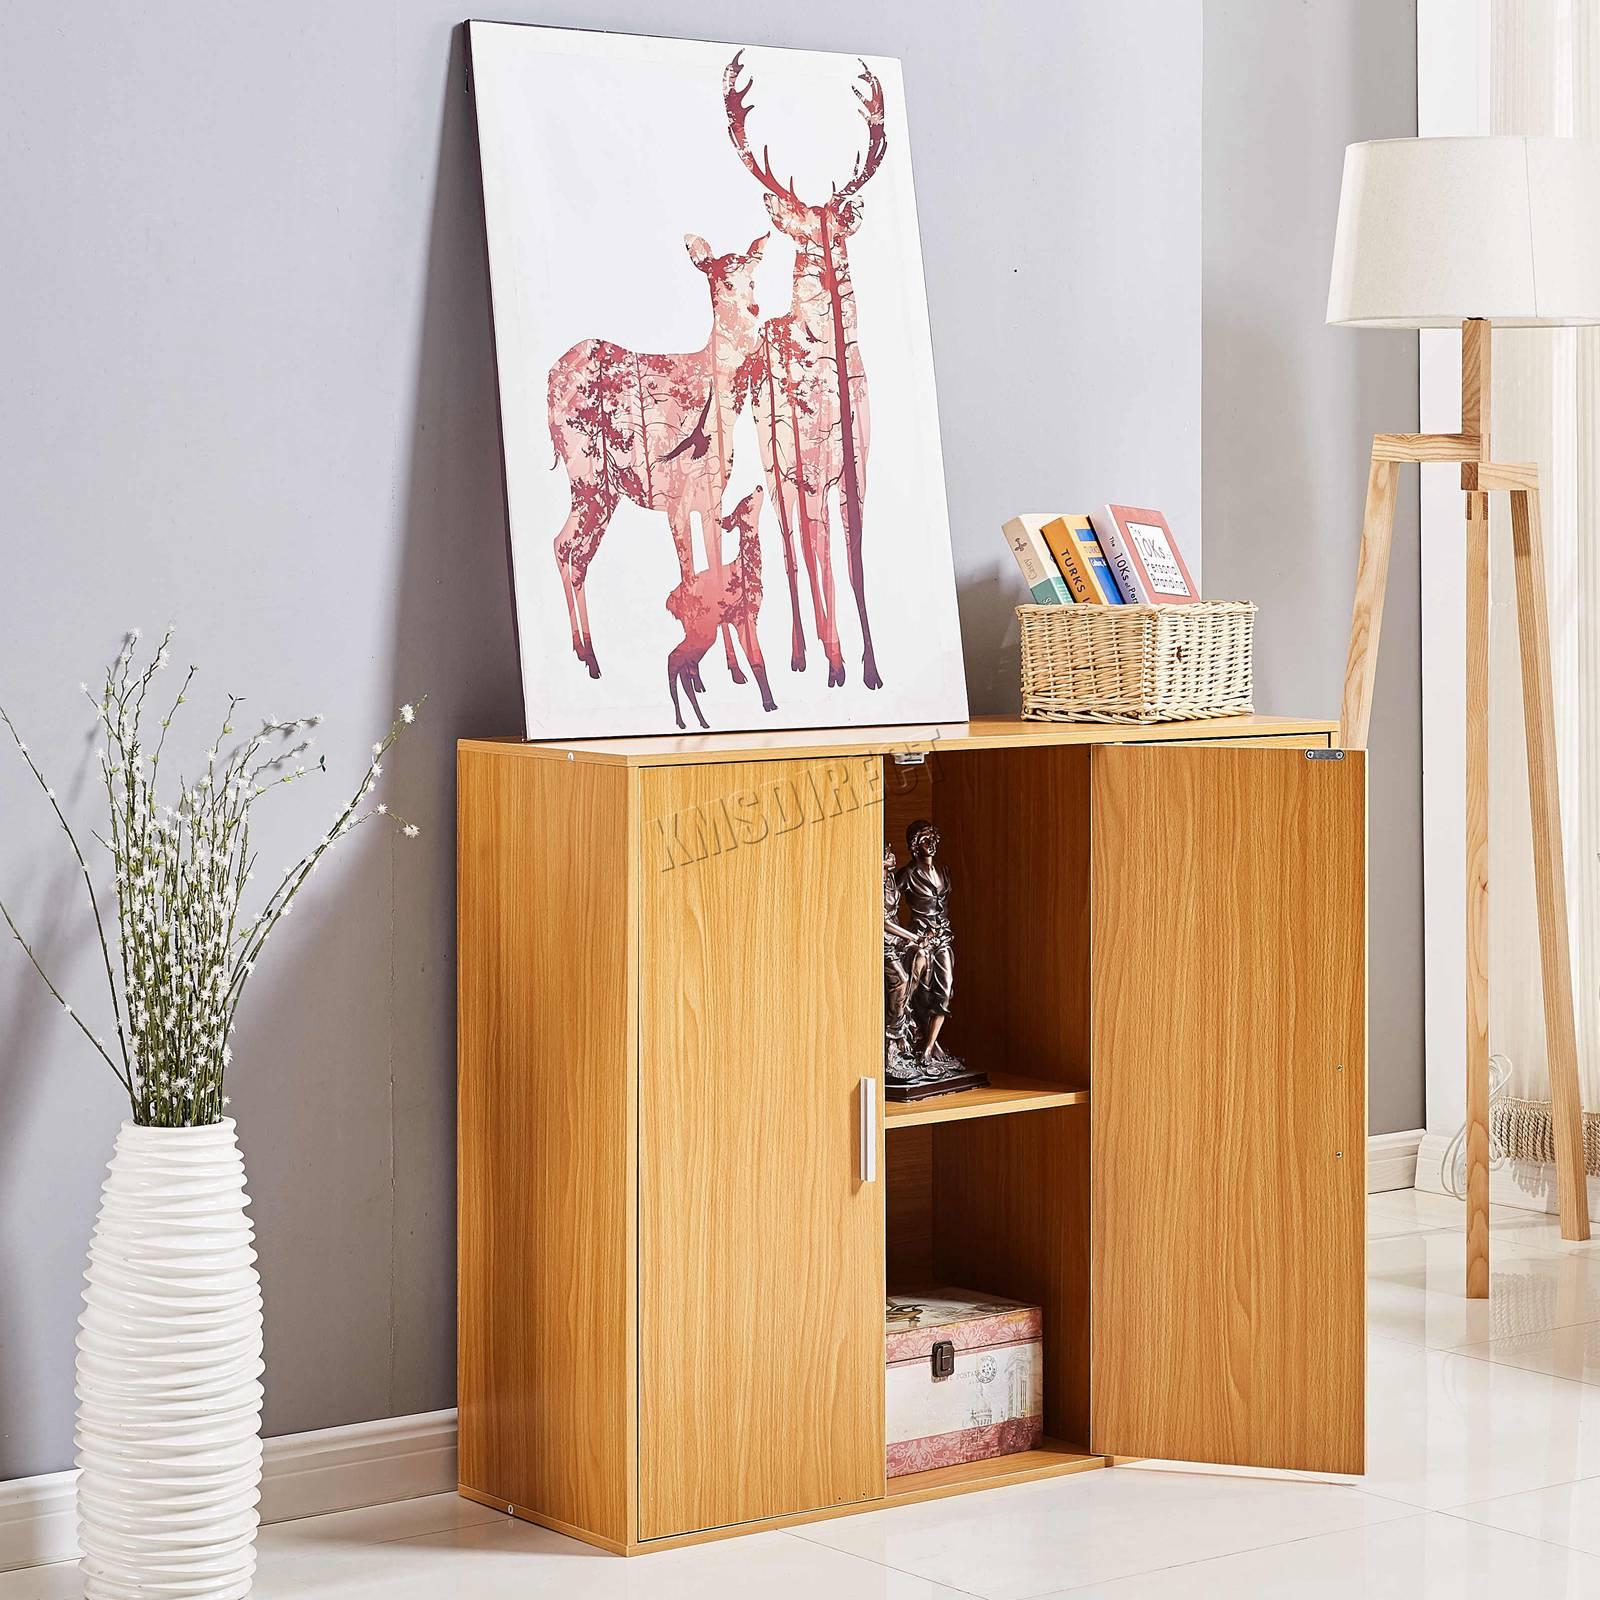 WestWood-Sideboard-Cabinet-Storage-tableware-Kitchen-Cupboard-Unit-PB-SSP01-NEW thumbnail 15